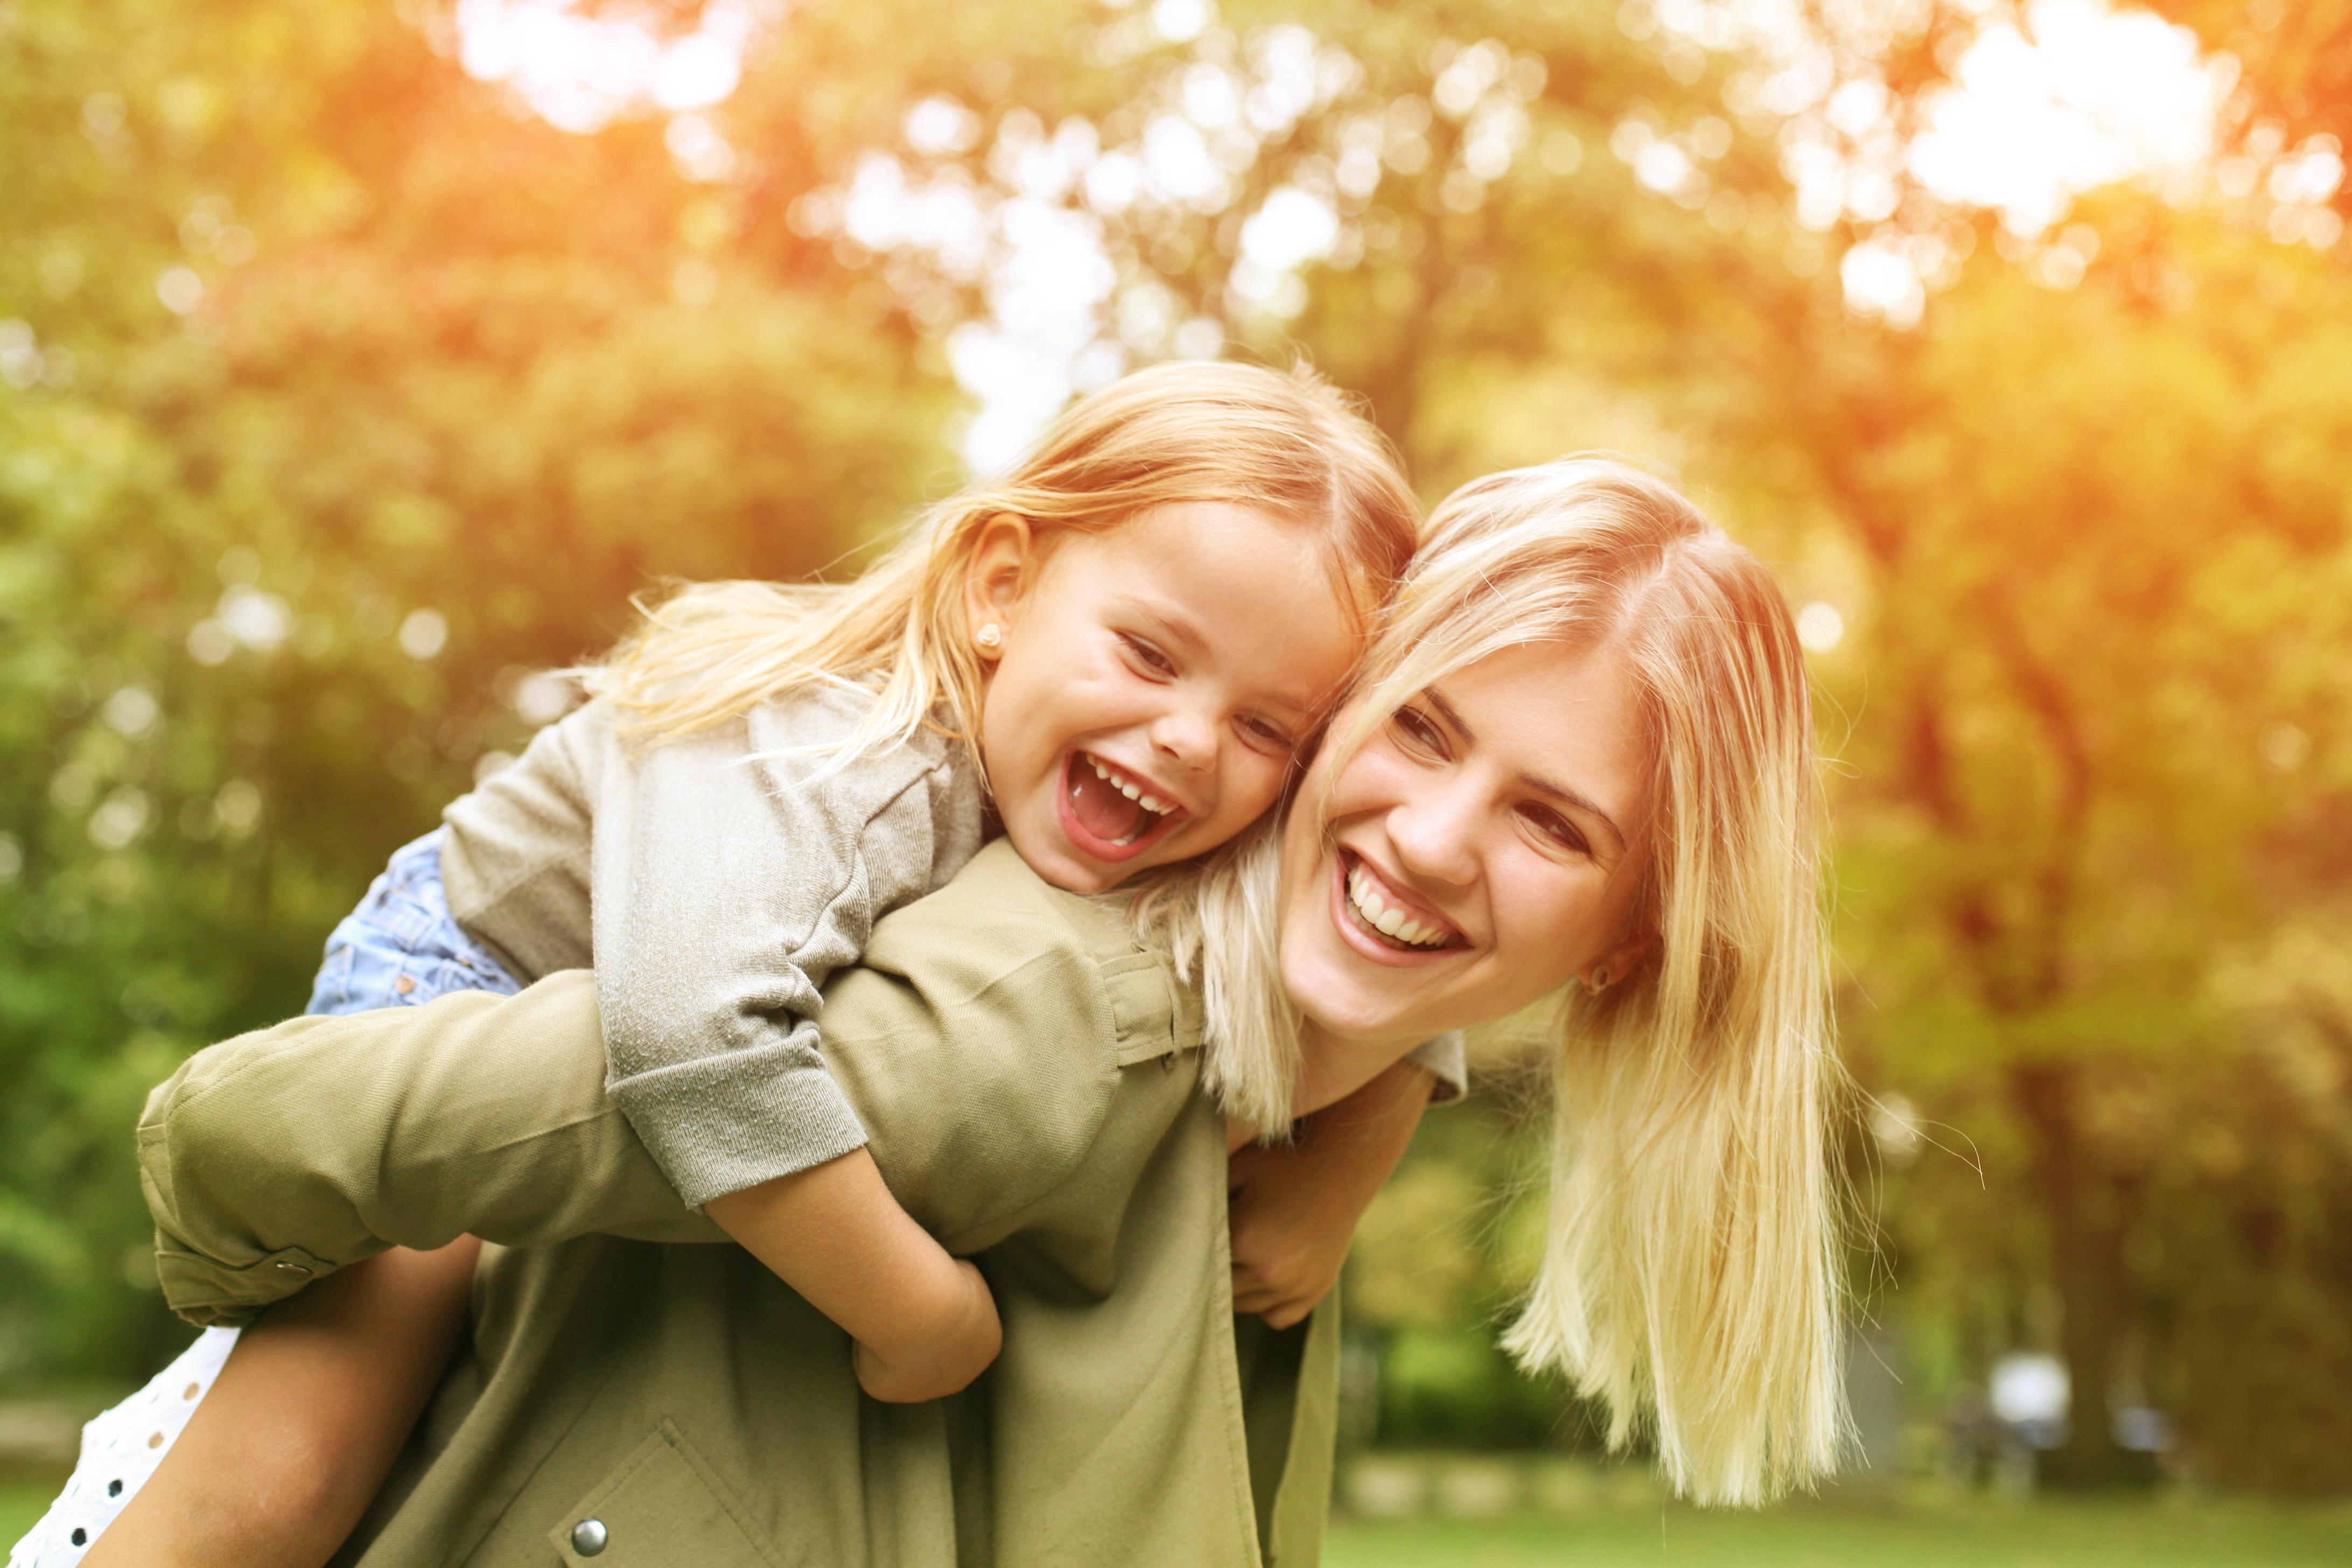 A Happy Woman | Woman 2 Woman Today!